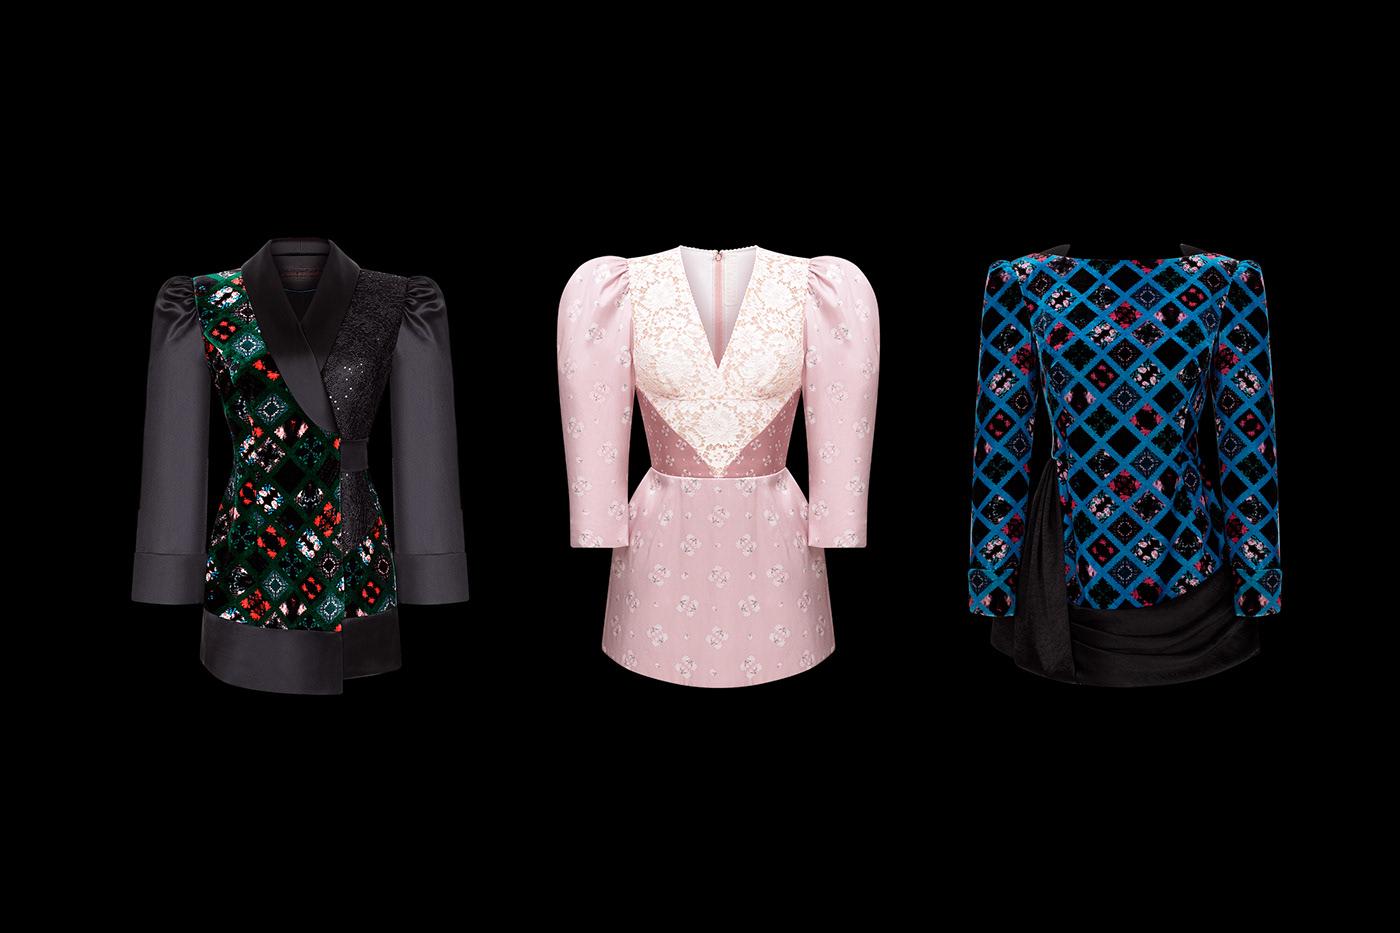 couture Fashion  graphic design  Invitation ulyana sergeenko кутюр мода пригласительные letterpress paris fashion week